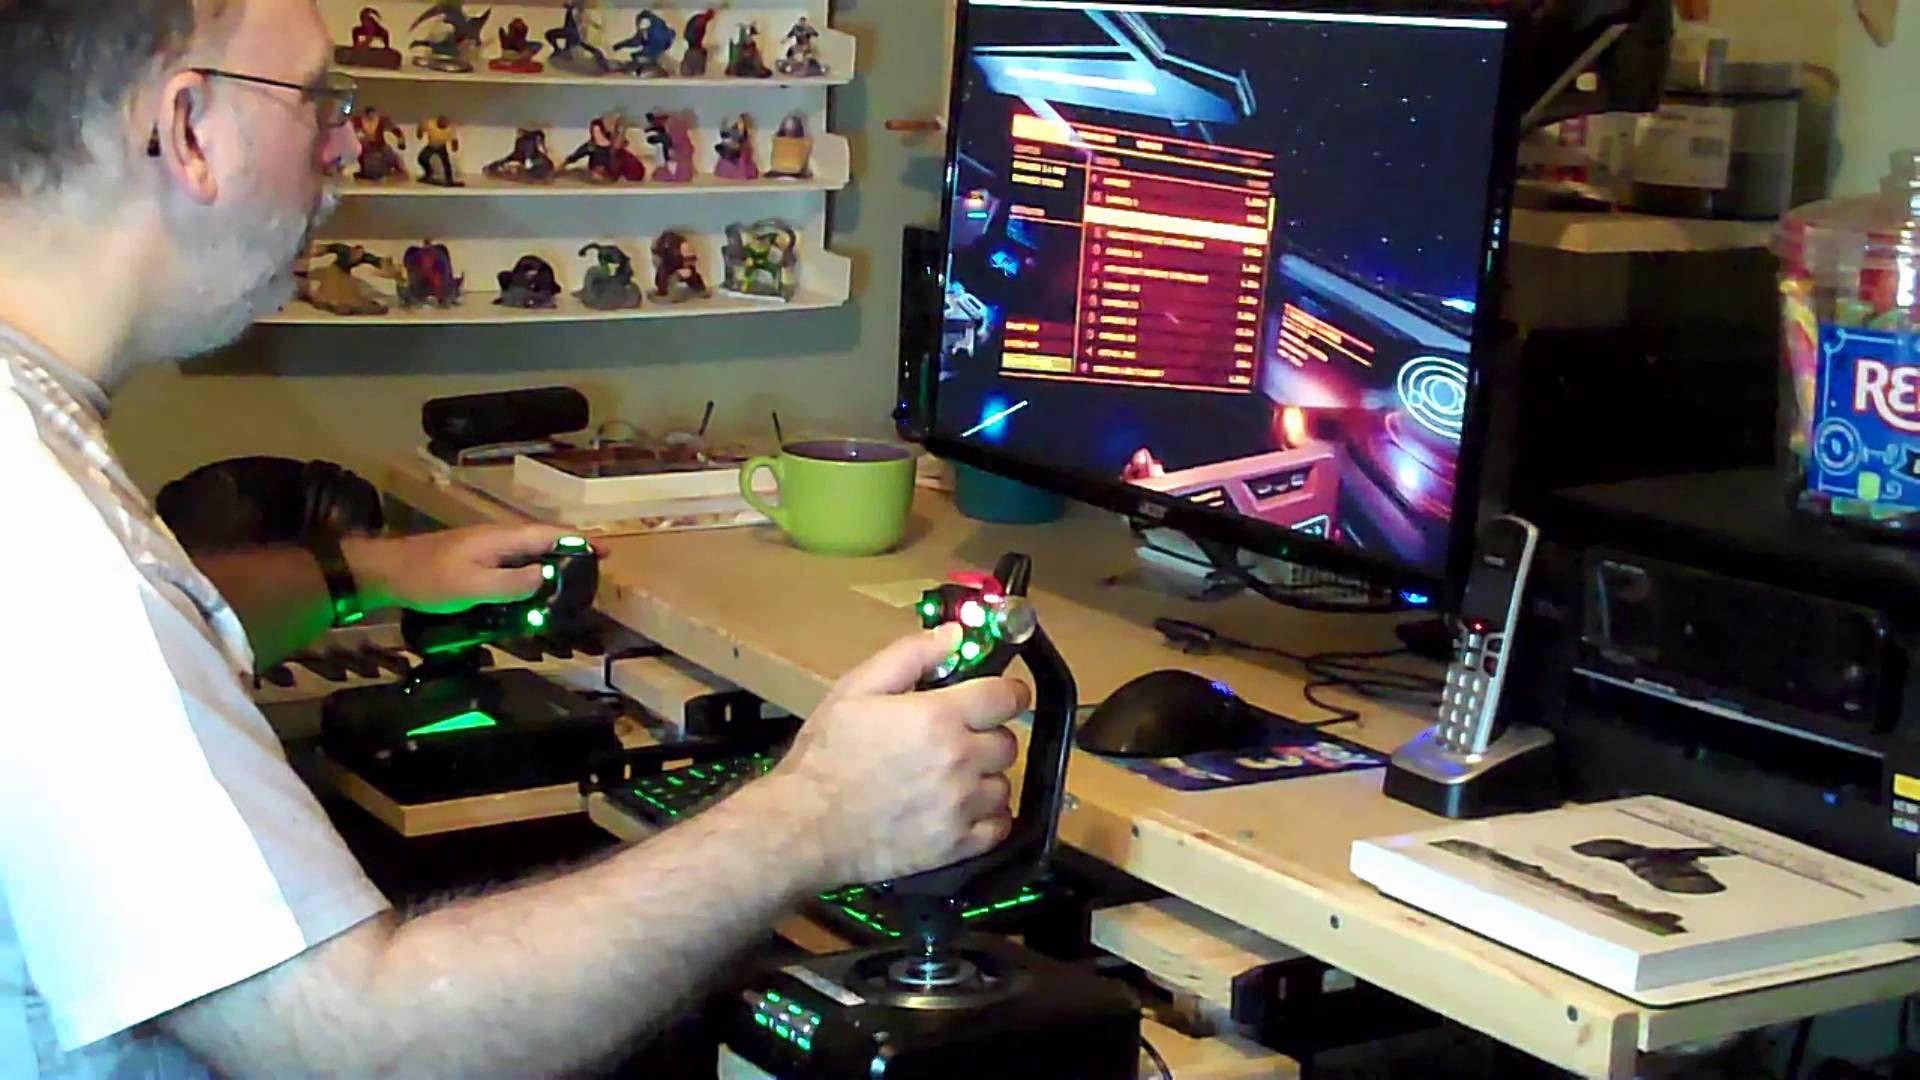 Elite Dangerous Hotas Desk Mounts Gaming Station Shipping Container Homes Flight Simulator Cockpit